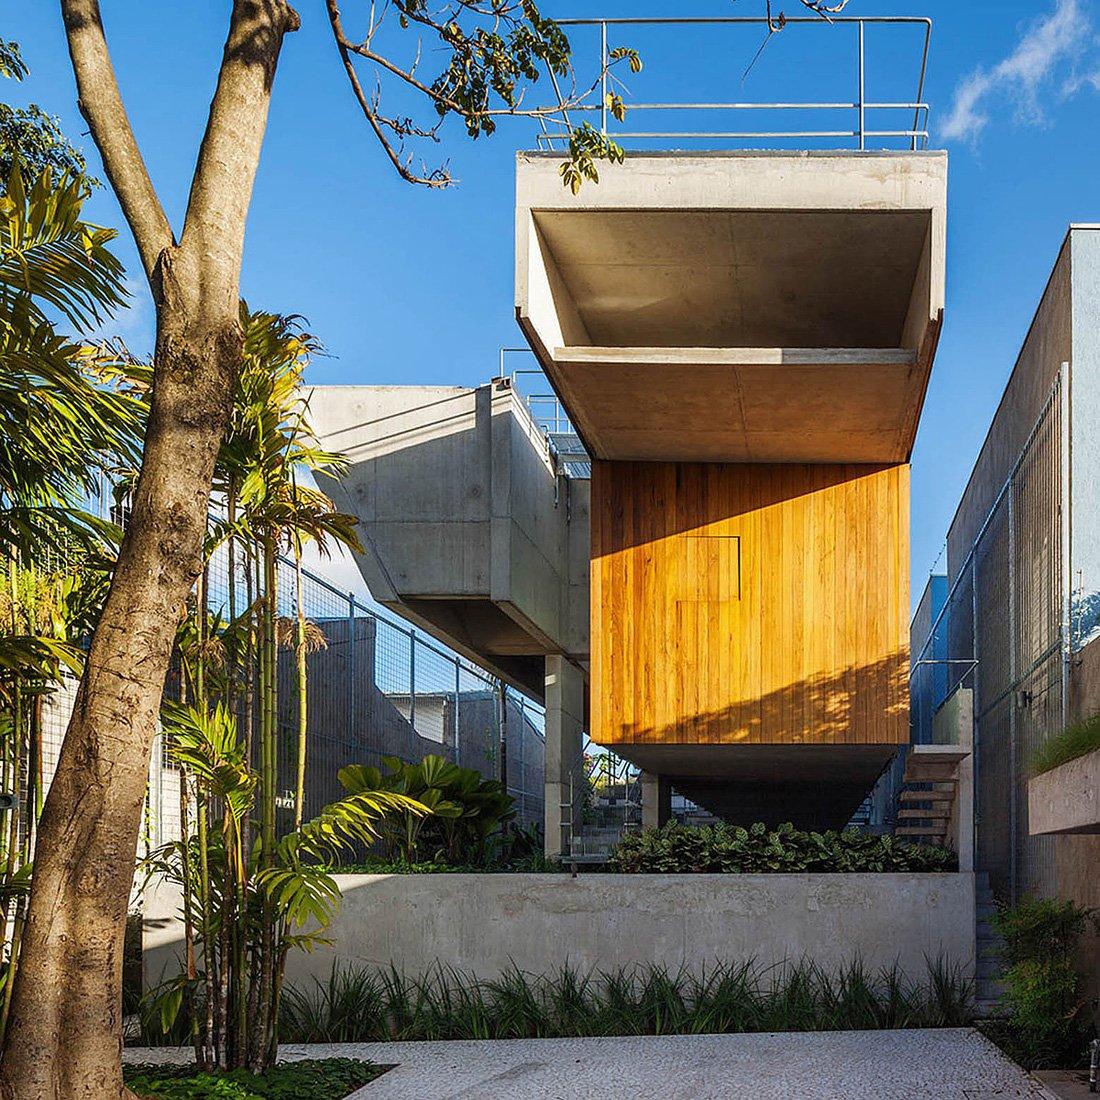 Weekend-House-in-Downtown-Sao-Paulo-03